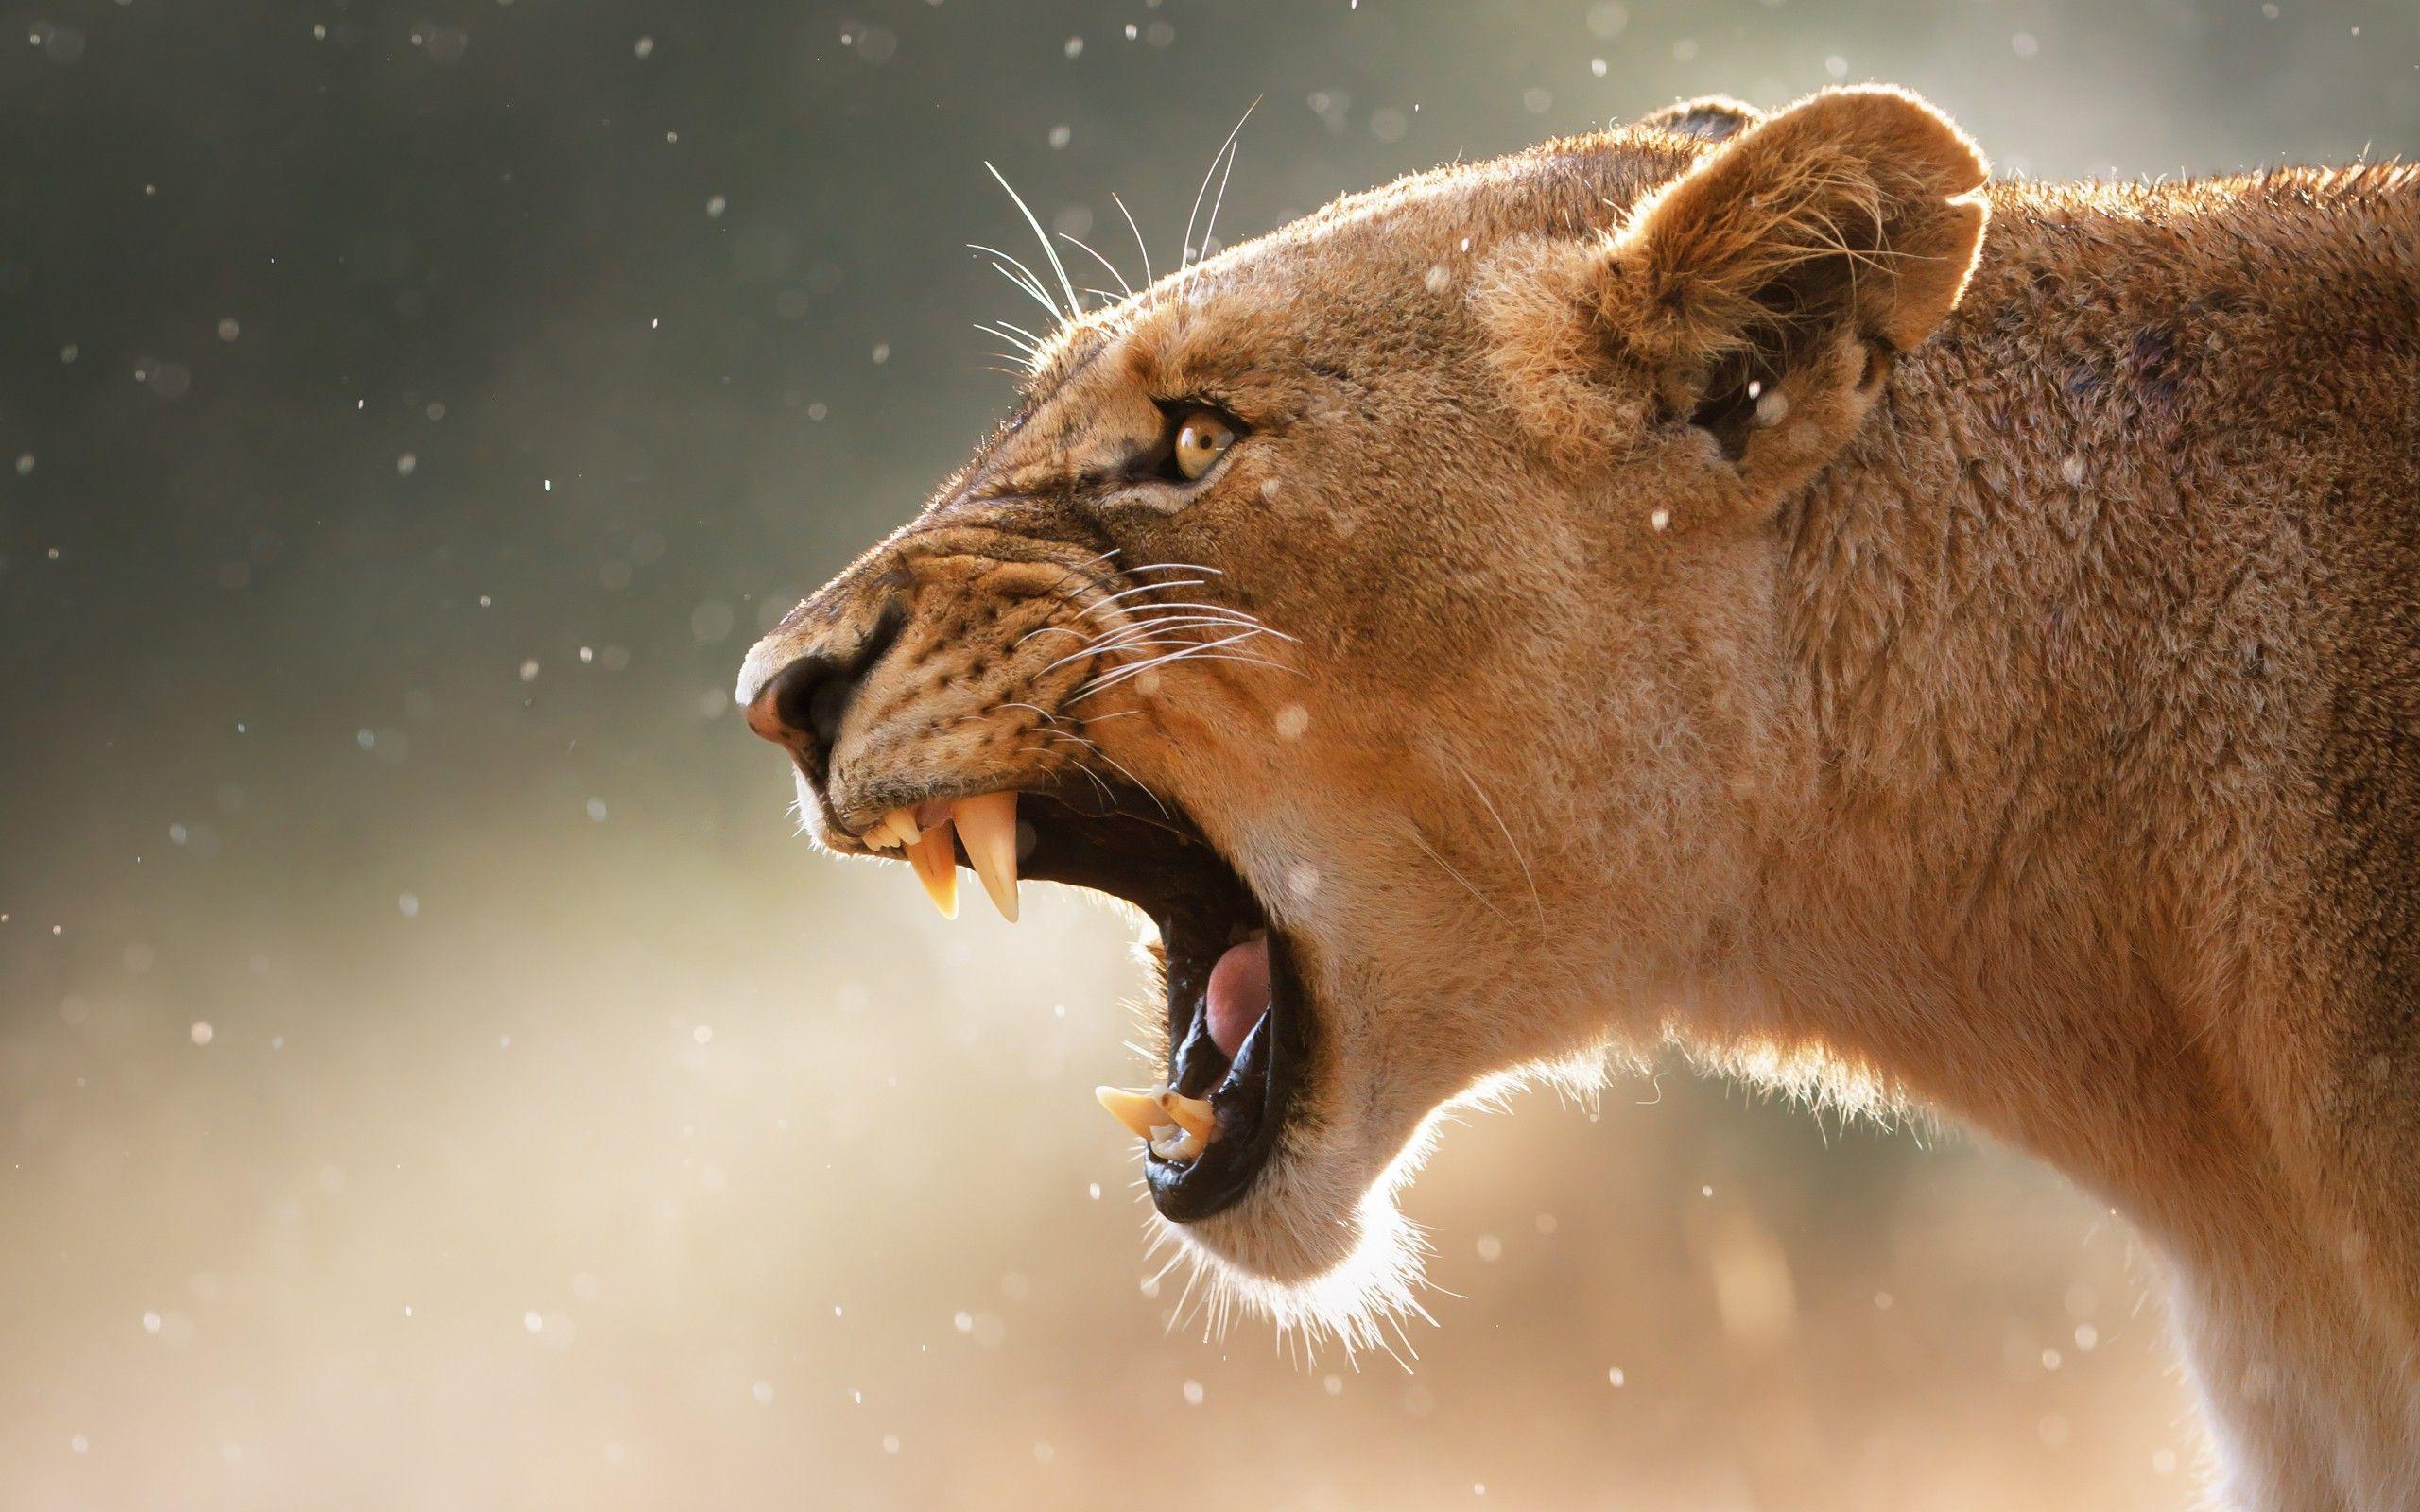 Lioness Wallpapers Wallpaper